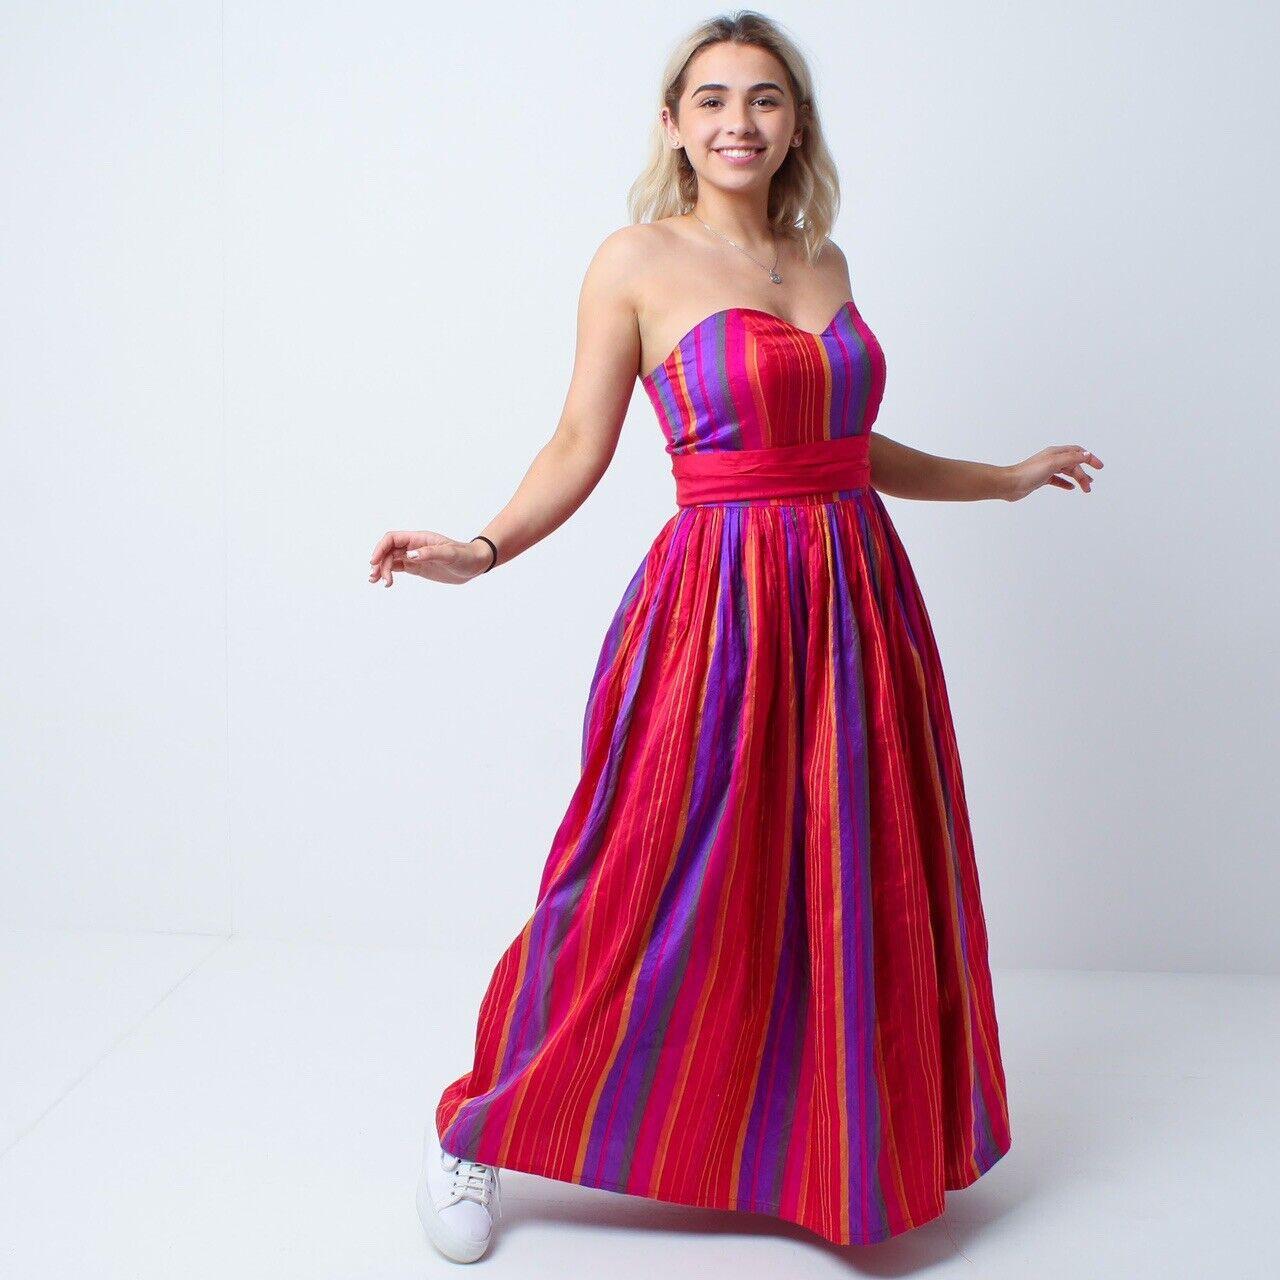 Monsoon Twilight Rainbow Stripe Silk Taffeta Evening Prom Pride Dress Ballgown S